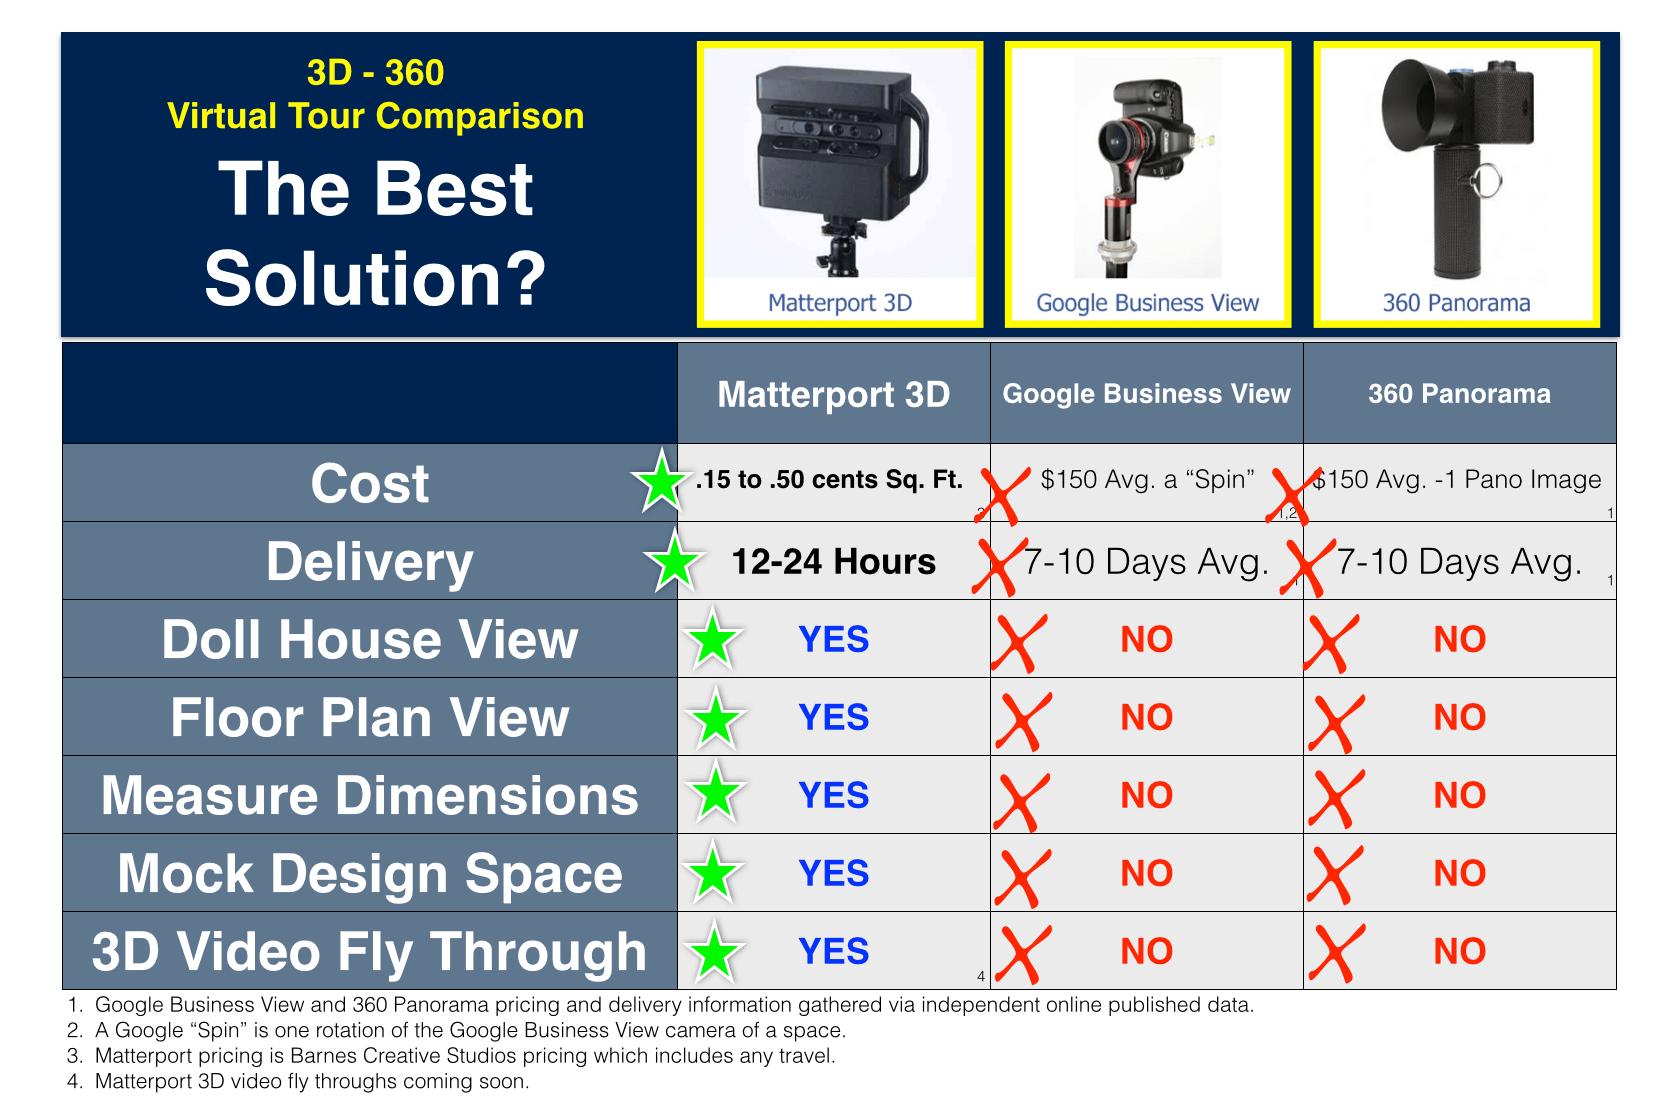 Virtual-Tour-Review-Matterport-3D-vs-Google-Business-View-vs-360-Panorama png